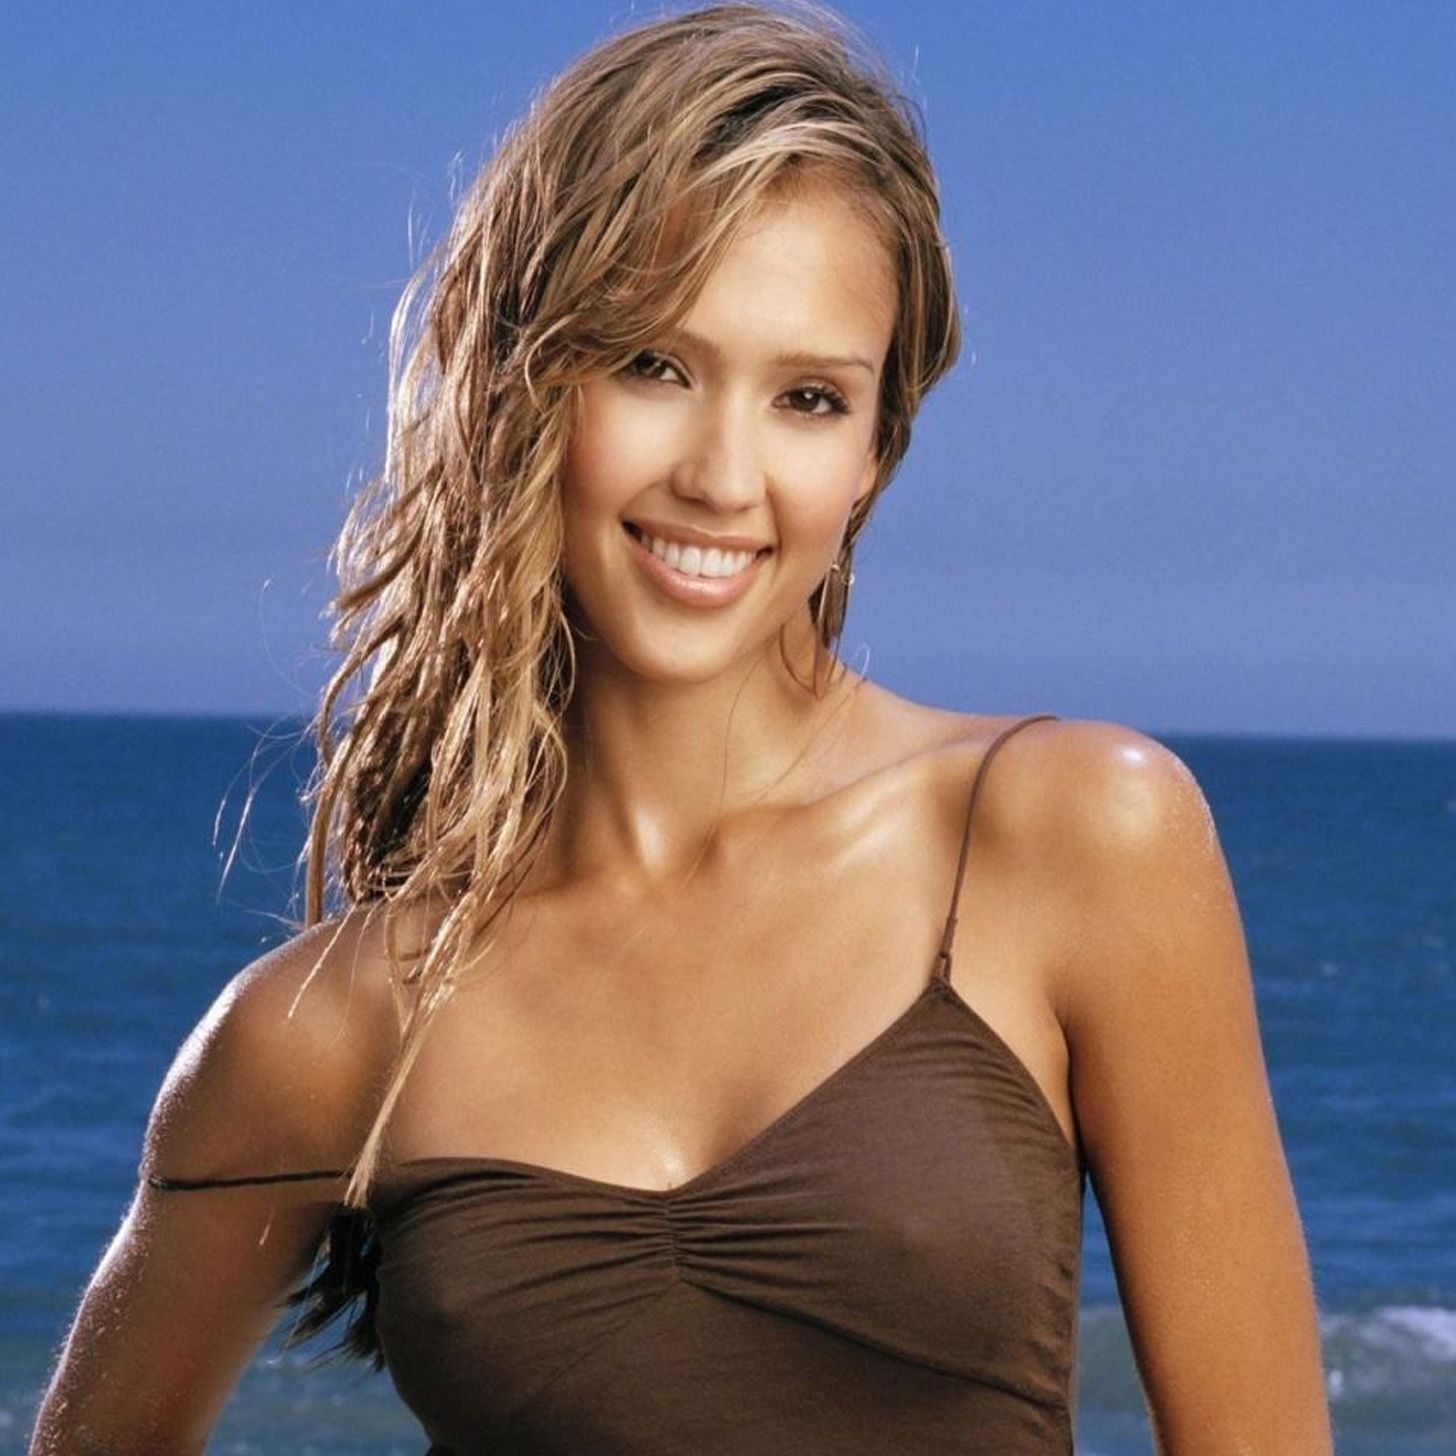 Bevery Hills 90210 Bikini Girls Hot